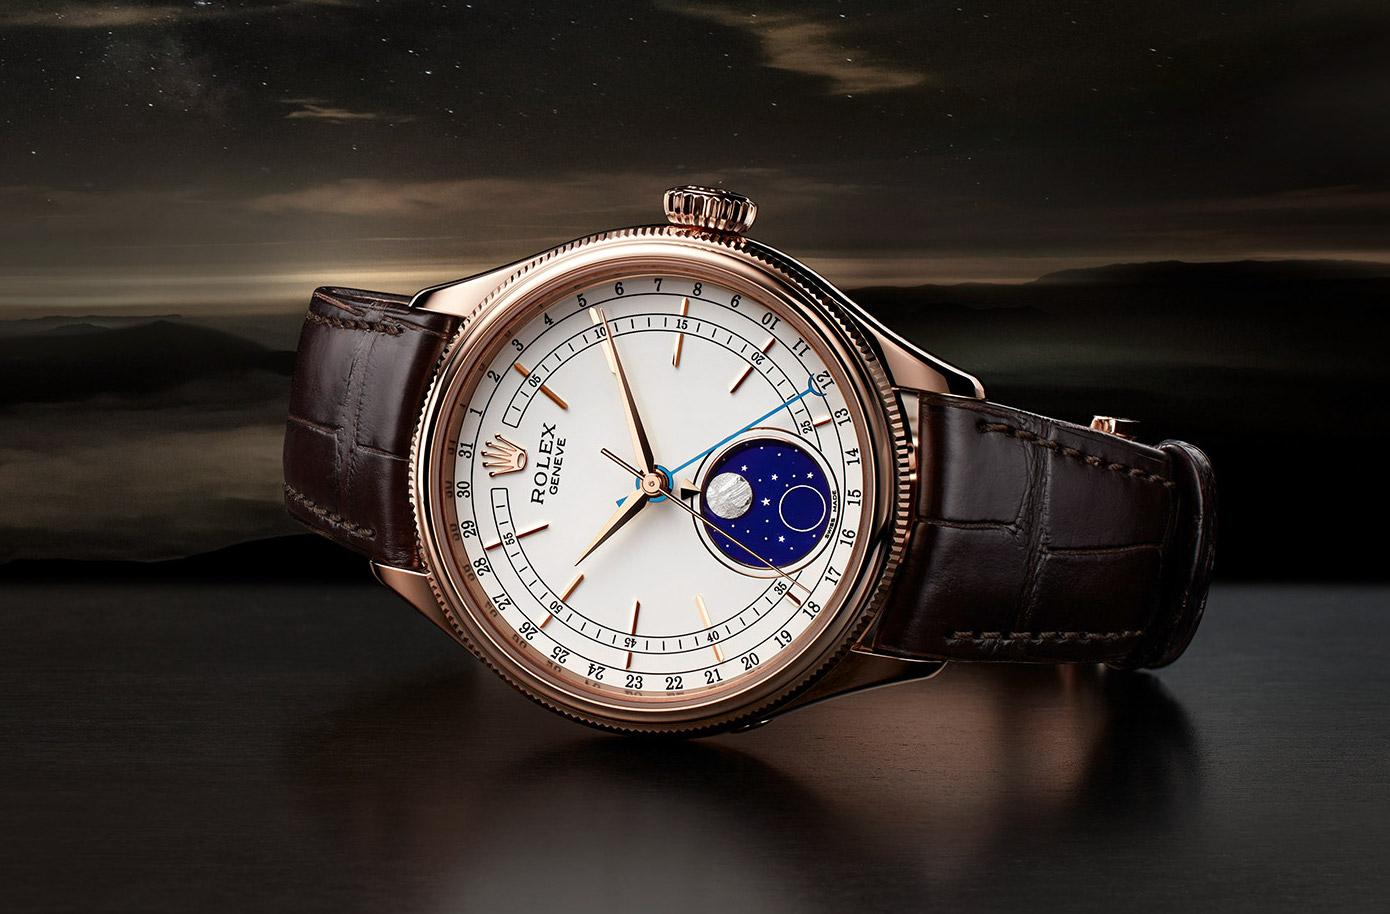 Khám phá vẻ đẹp hấp dẫn của đồng hồ Rolex Cellini Moonphase